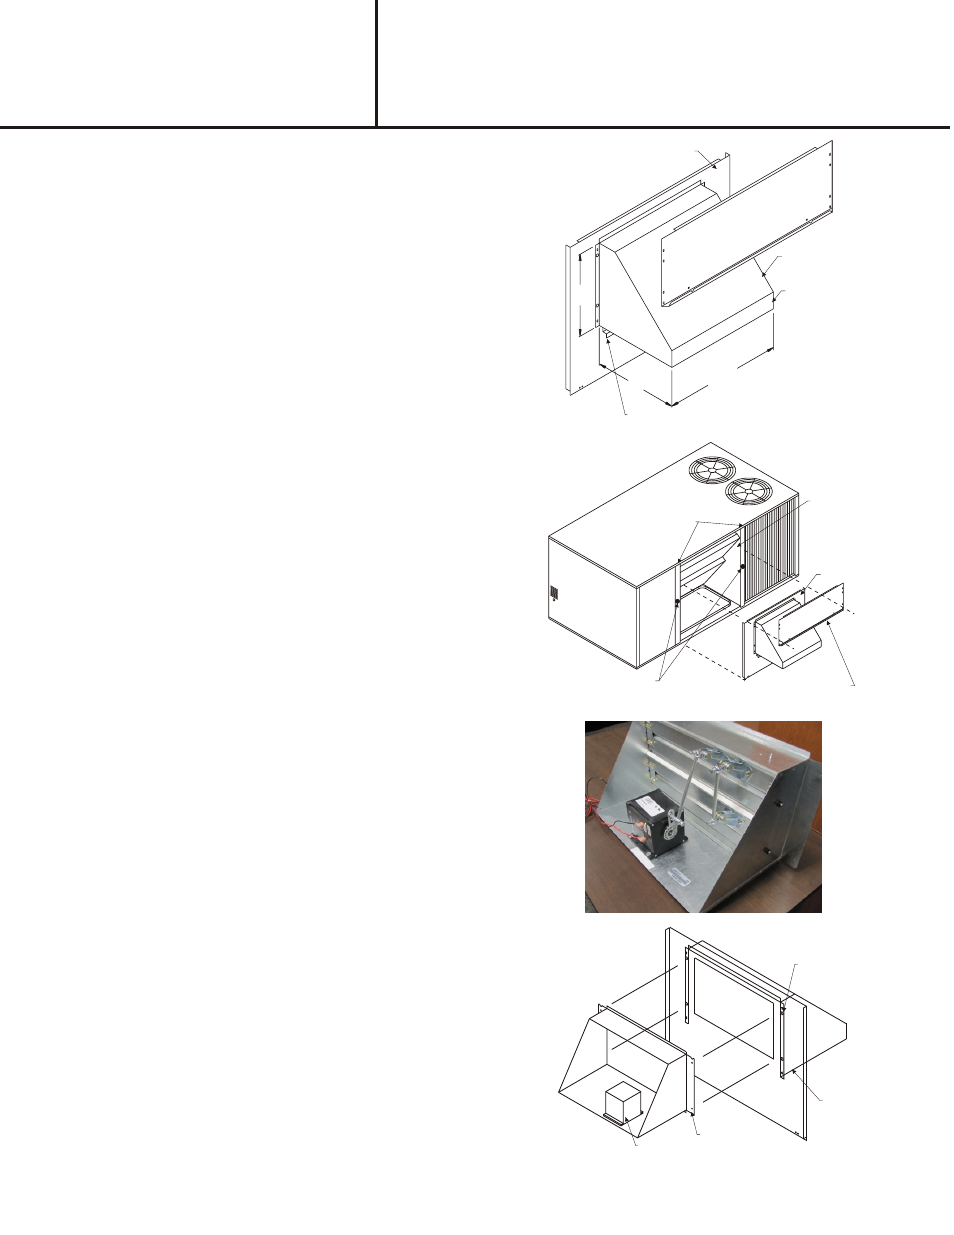 Reznor R6GP Option - Installatin - Outside Air Damper - Light